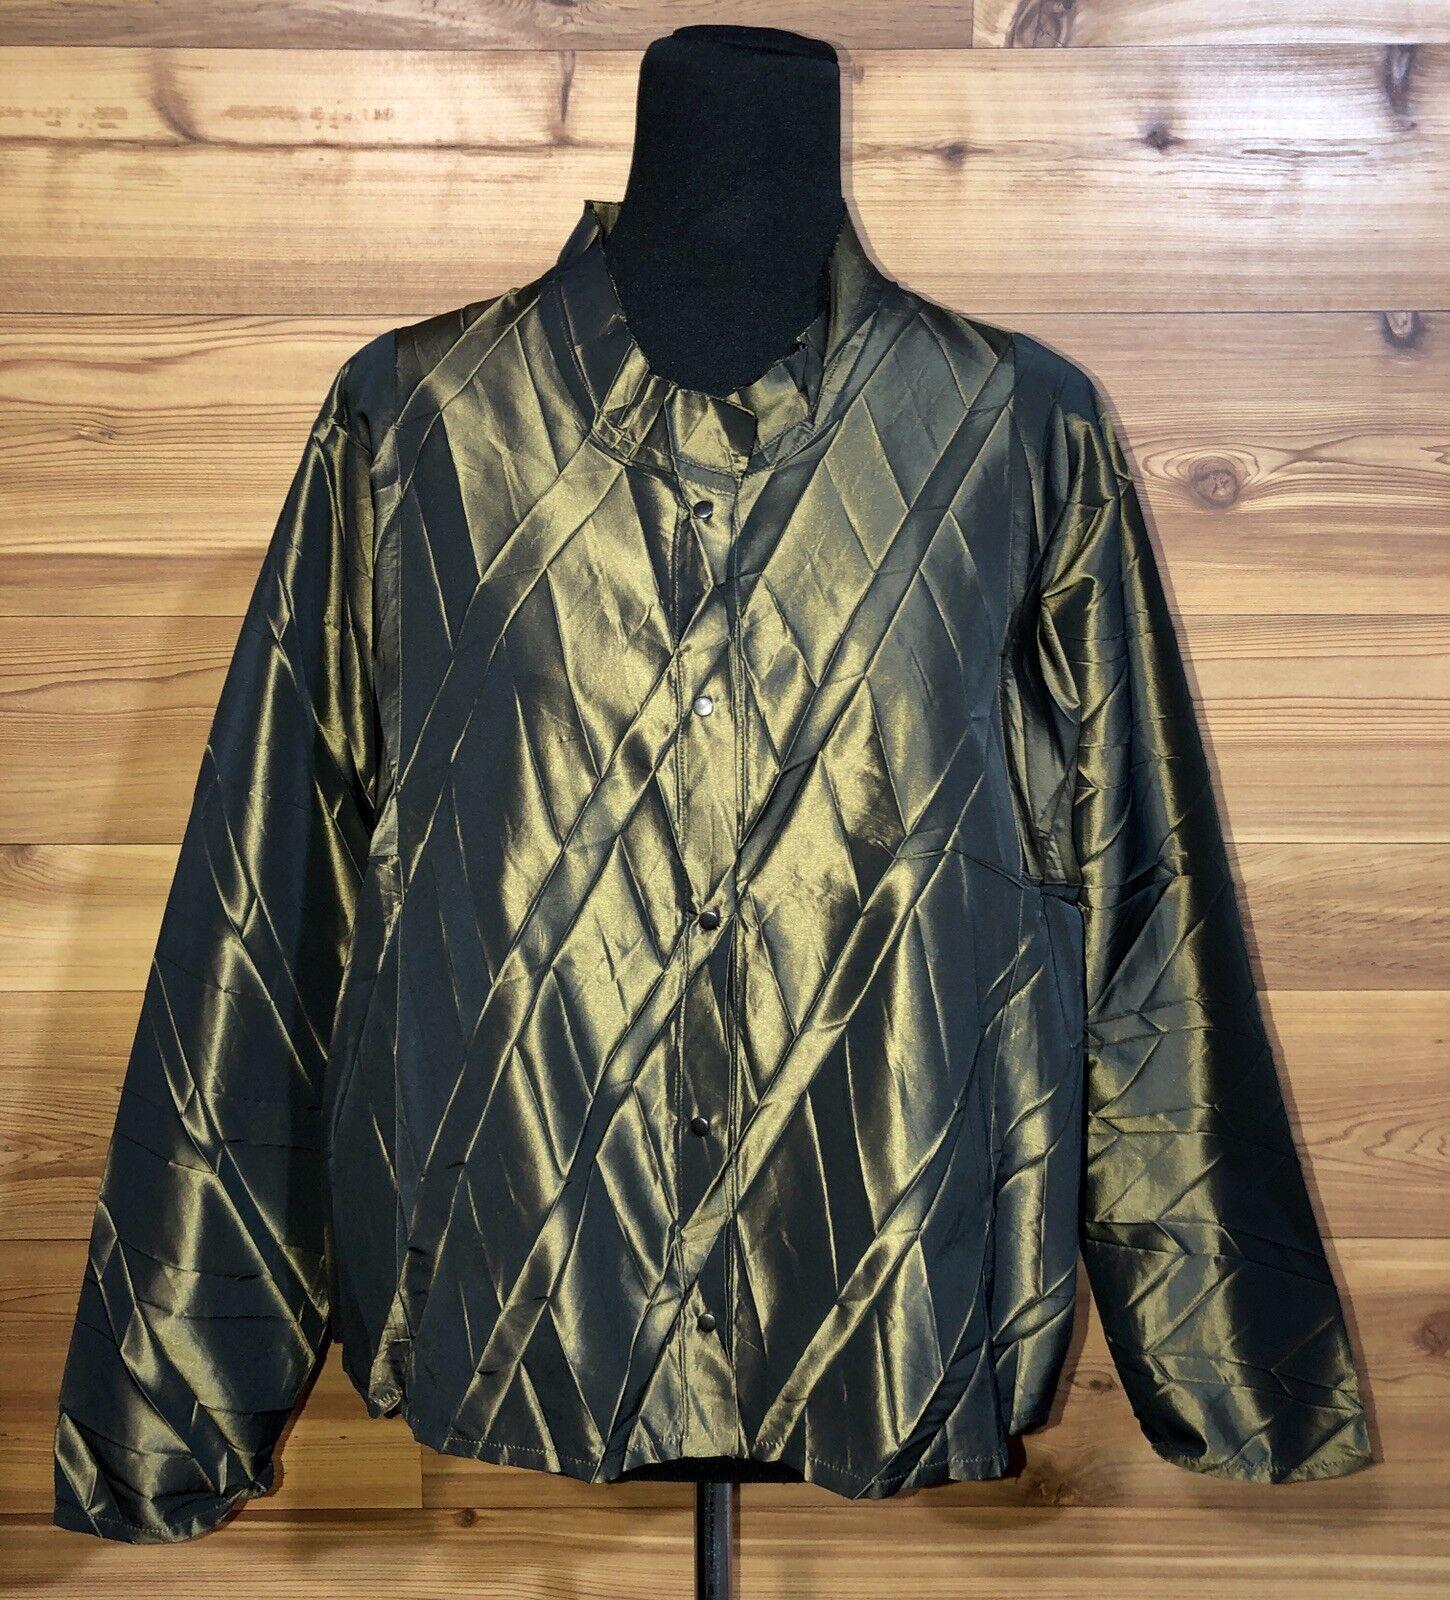 ArTsY Babette SF Stunning Grünish Bronze Pleated Jacket Top S